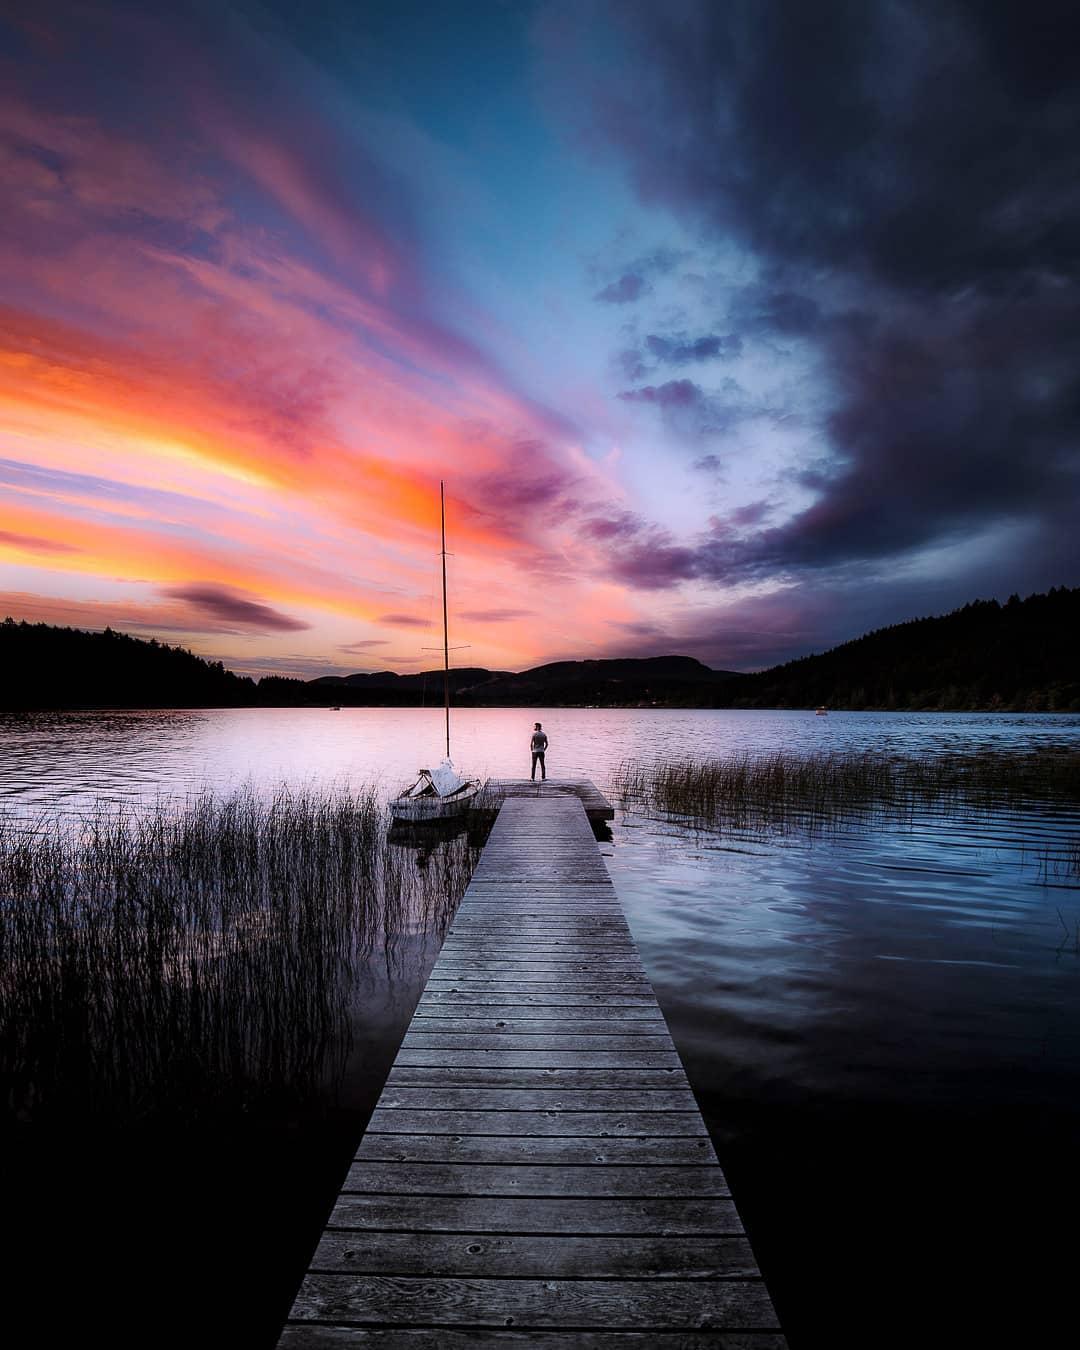 Природа и путешествия на снимках Таля Варди